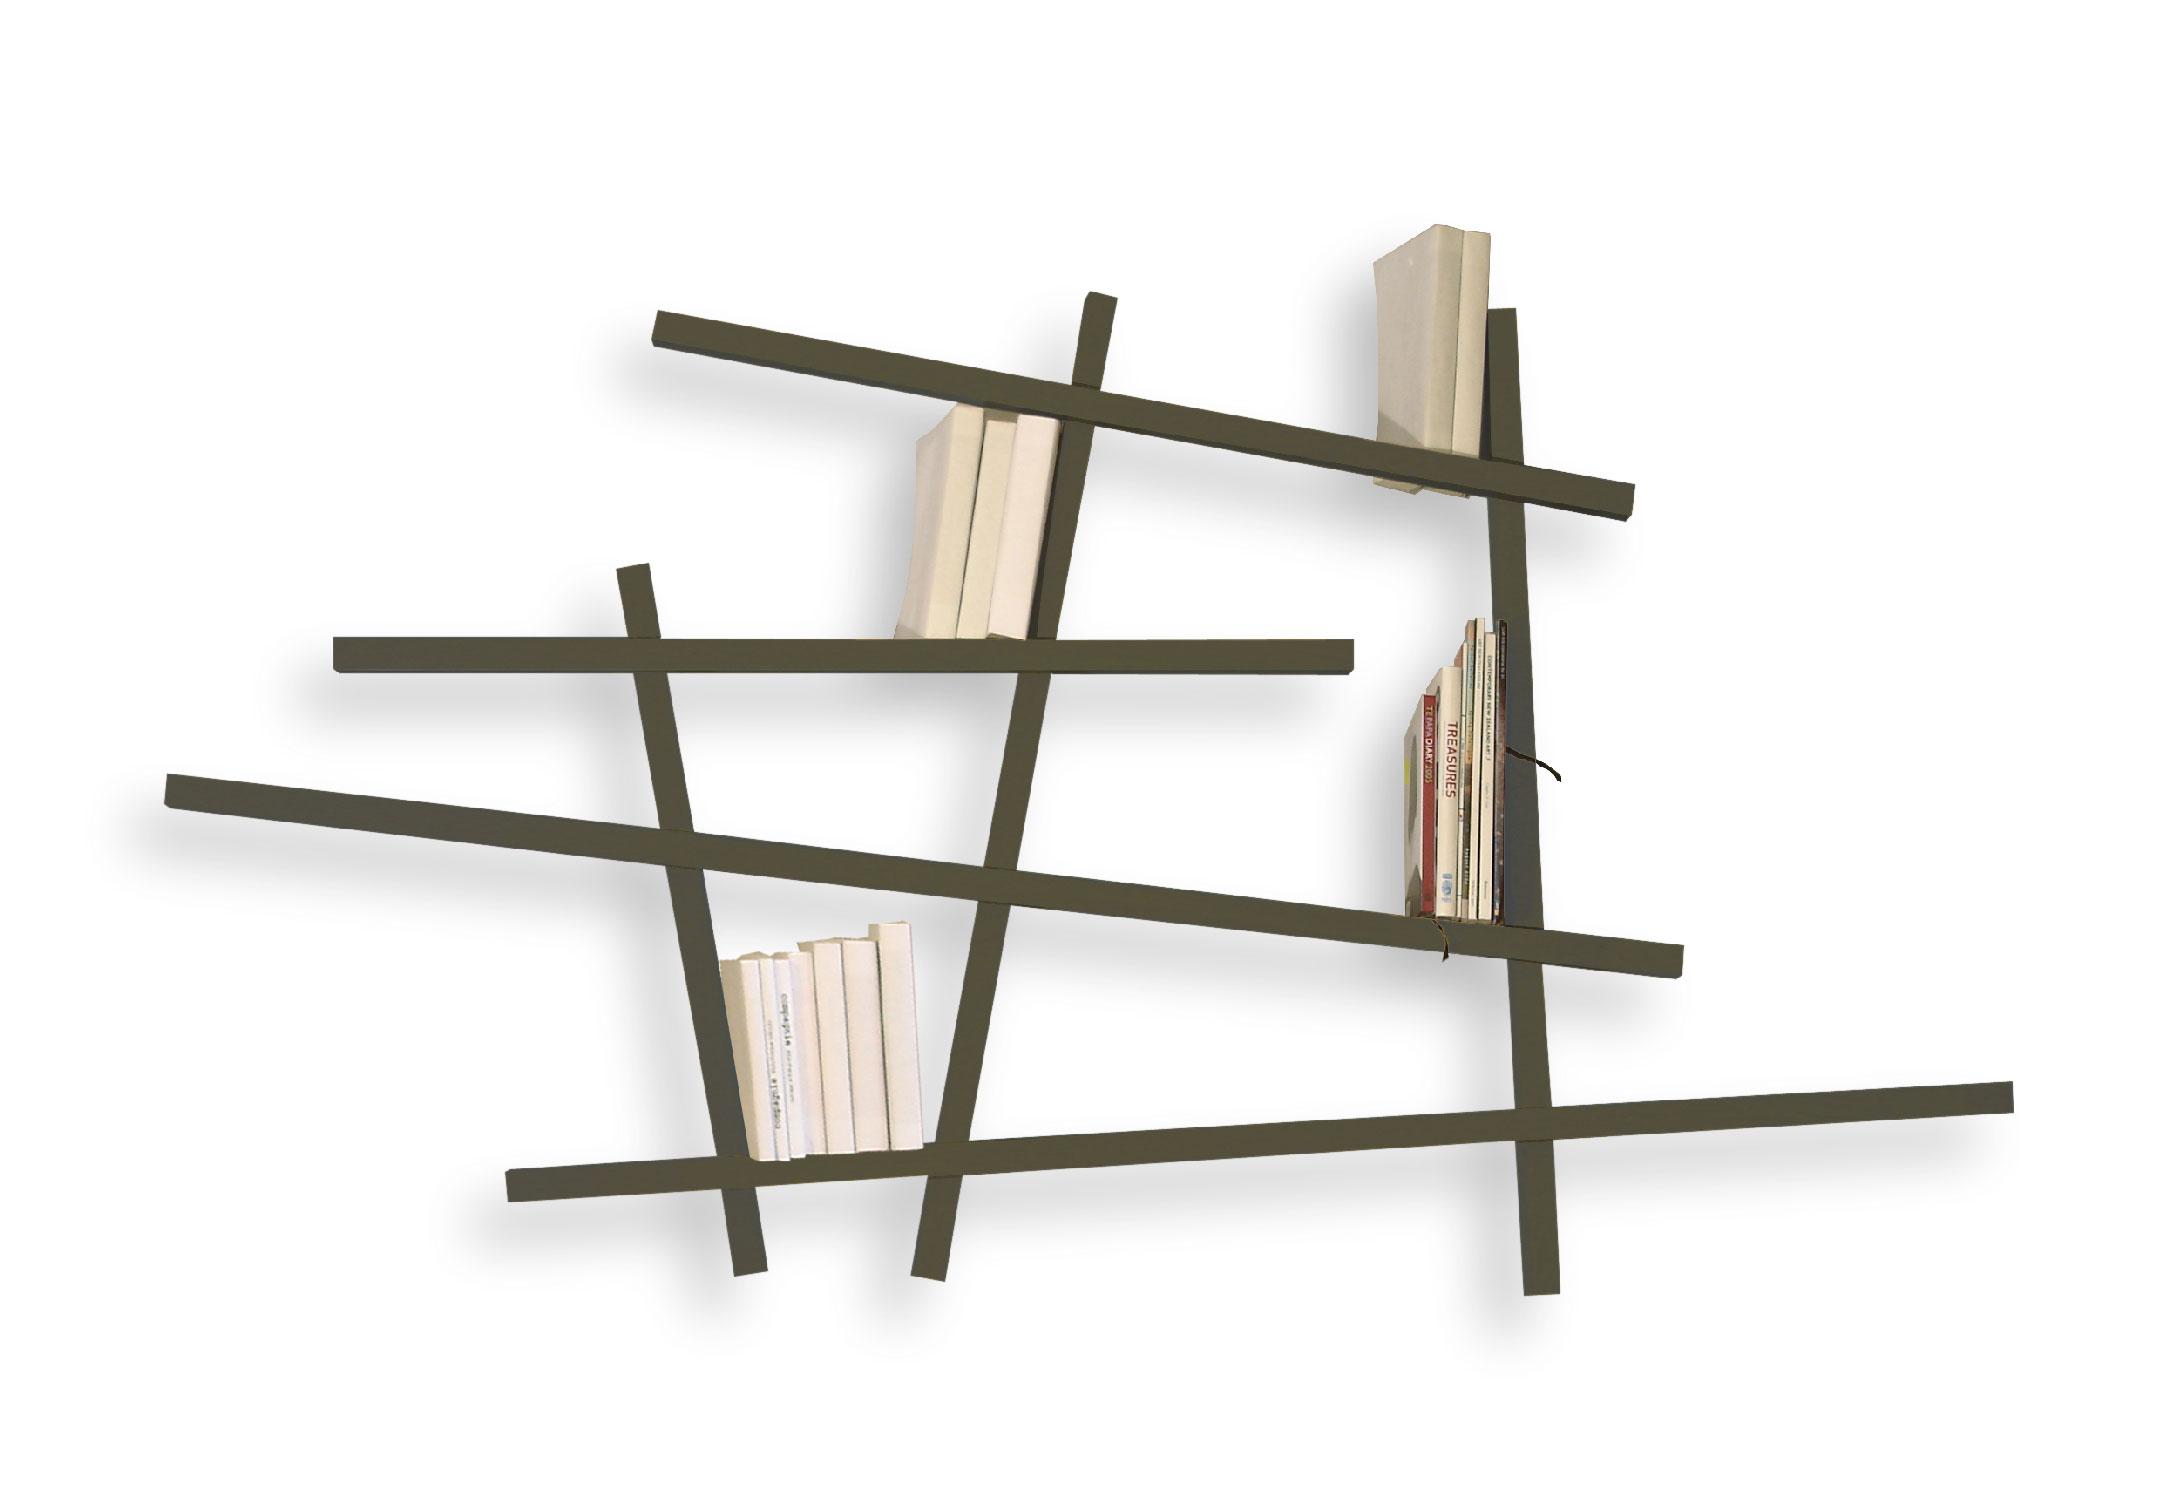 biblioth que mikado laqu e petit mod le. Black Bedroom Furniture Sets. Home Design Ideas